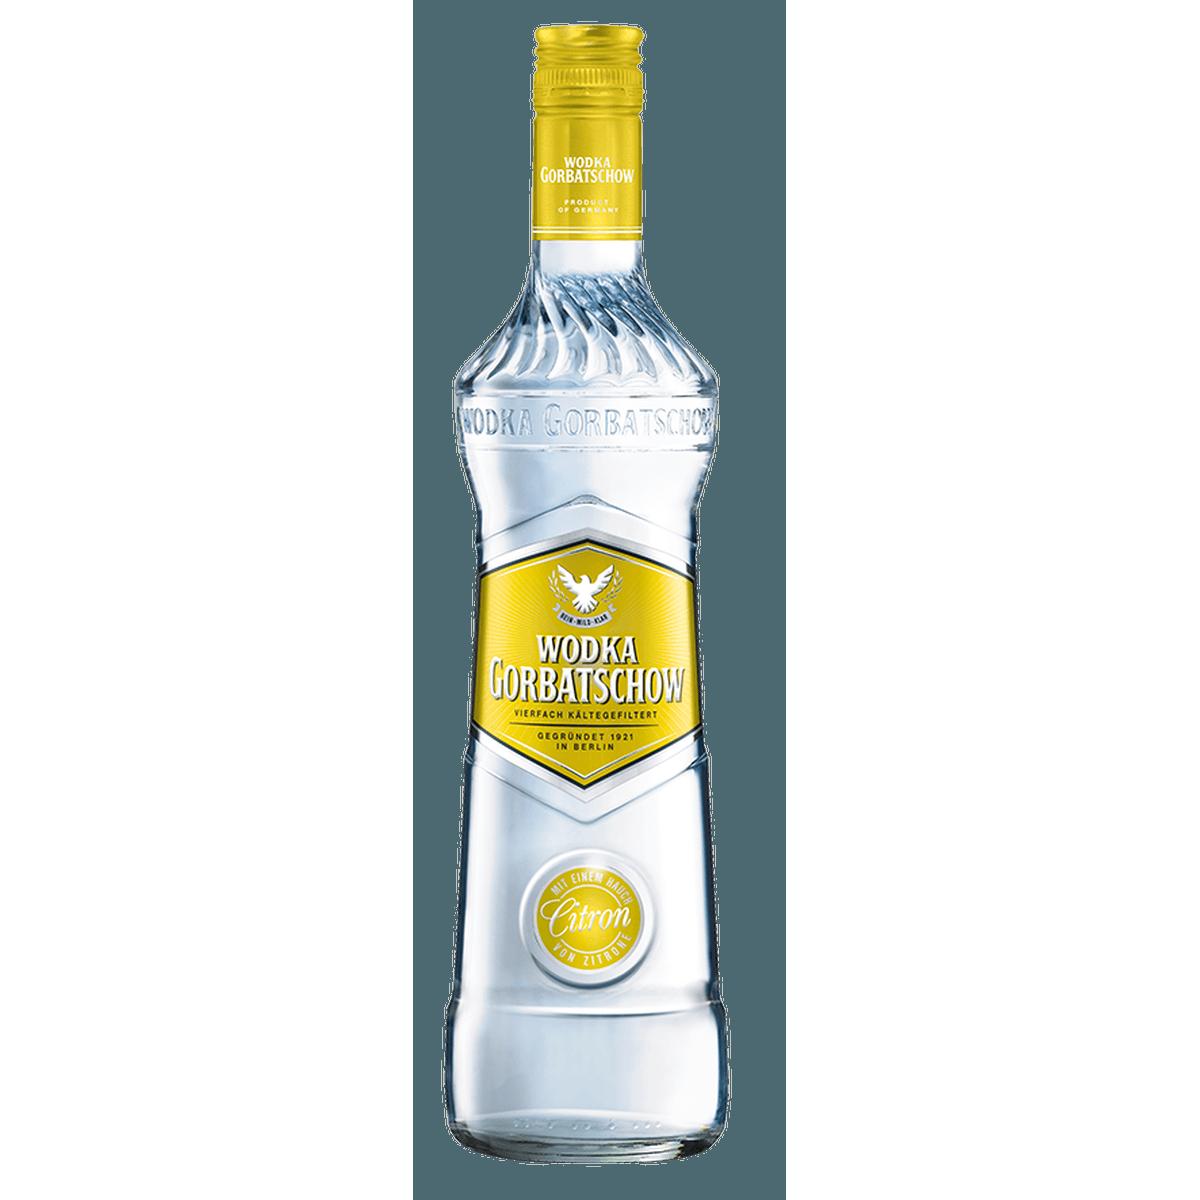 WODKA GORBATSCHOW Citron 37,5% 0,7L | Spirituosen Mixgetränke ...